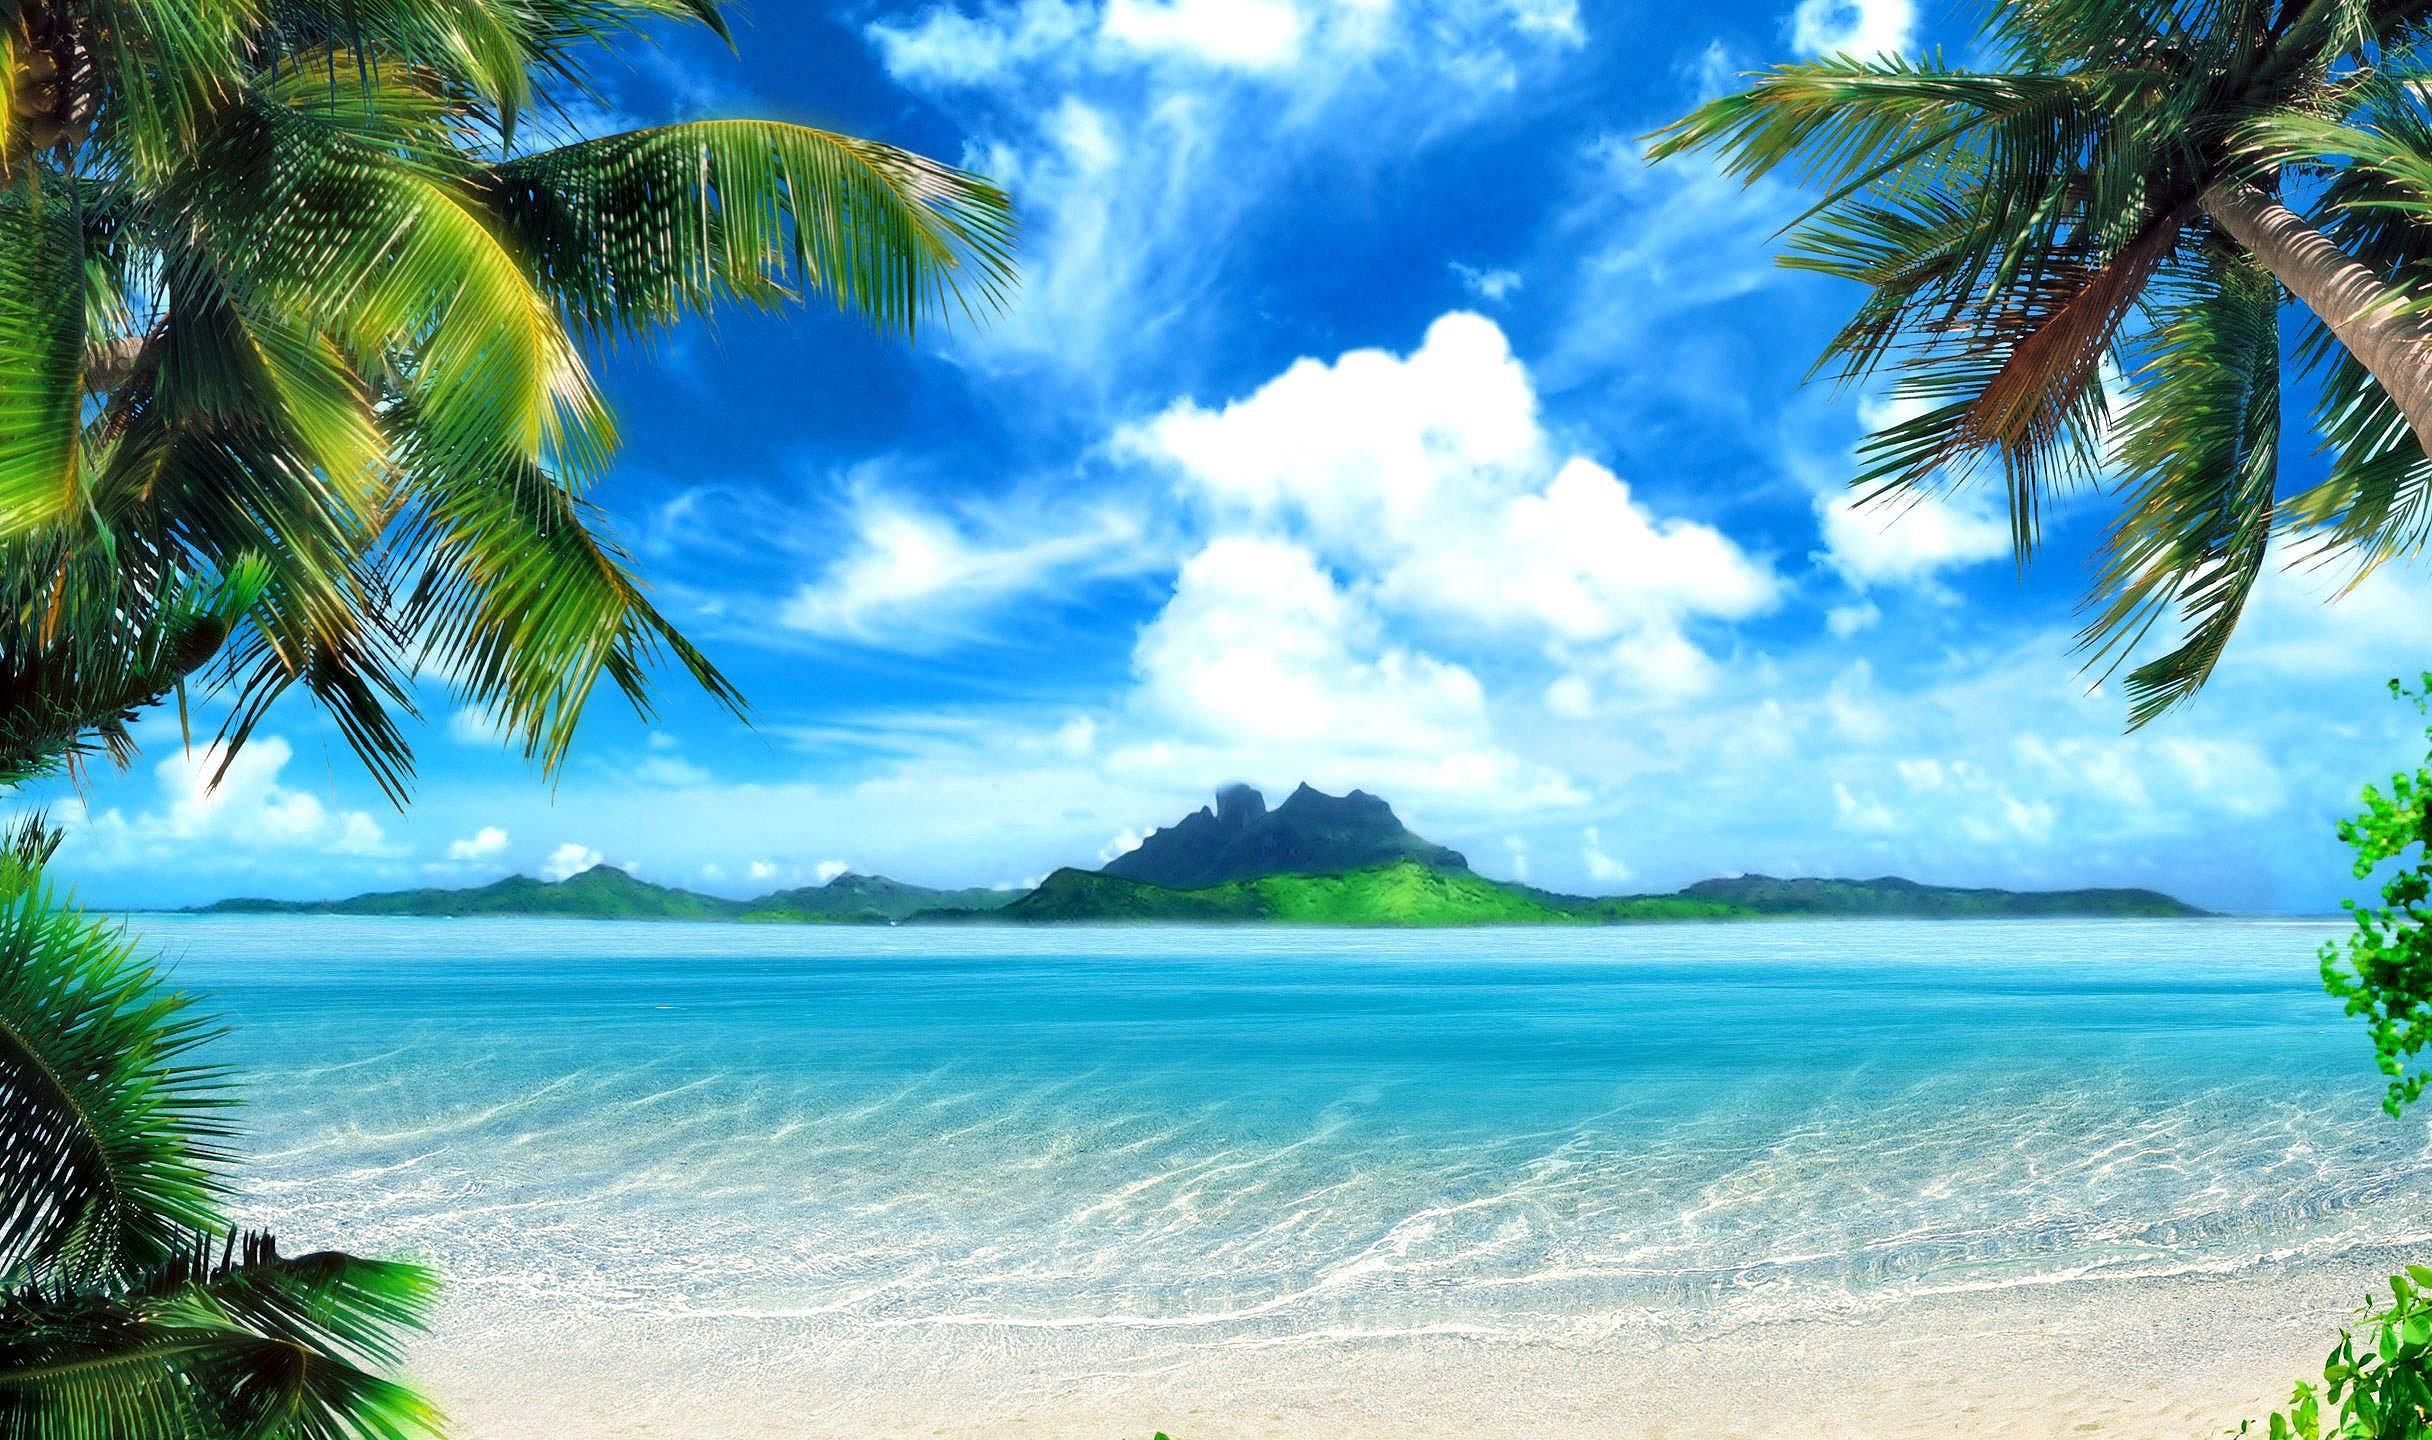 Tropical Desktop Backgrounds 54 Pictures